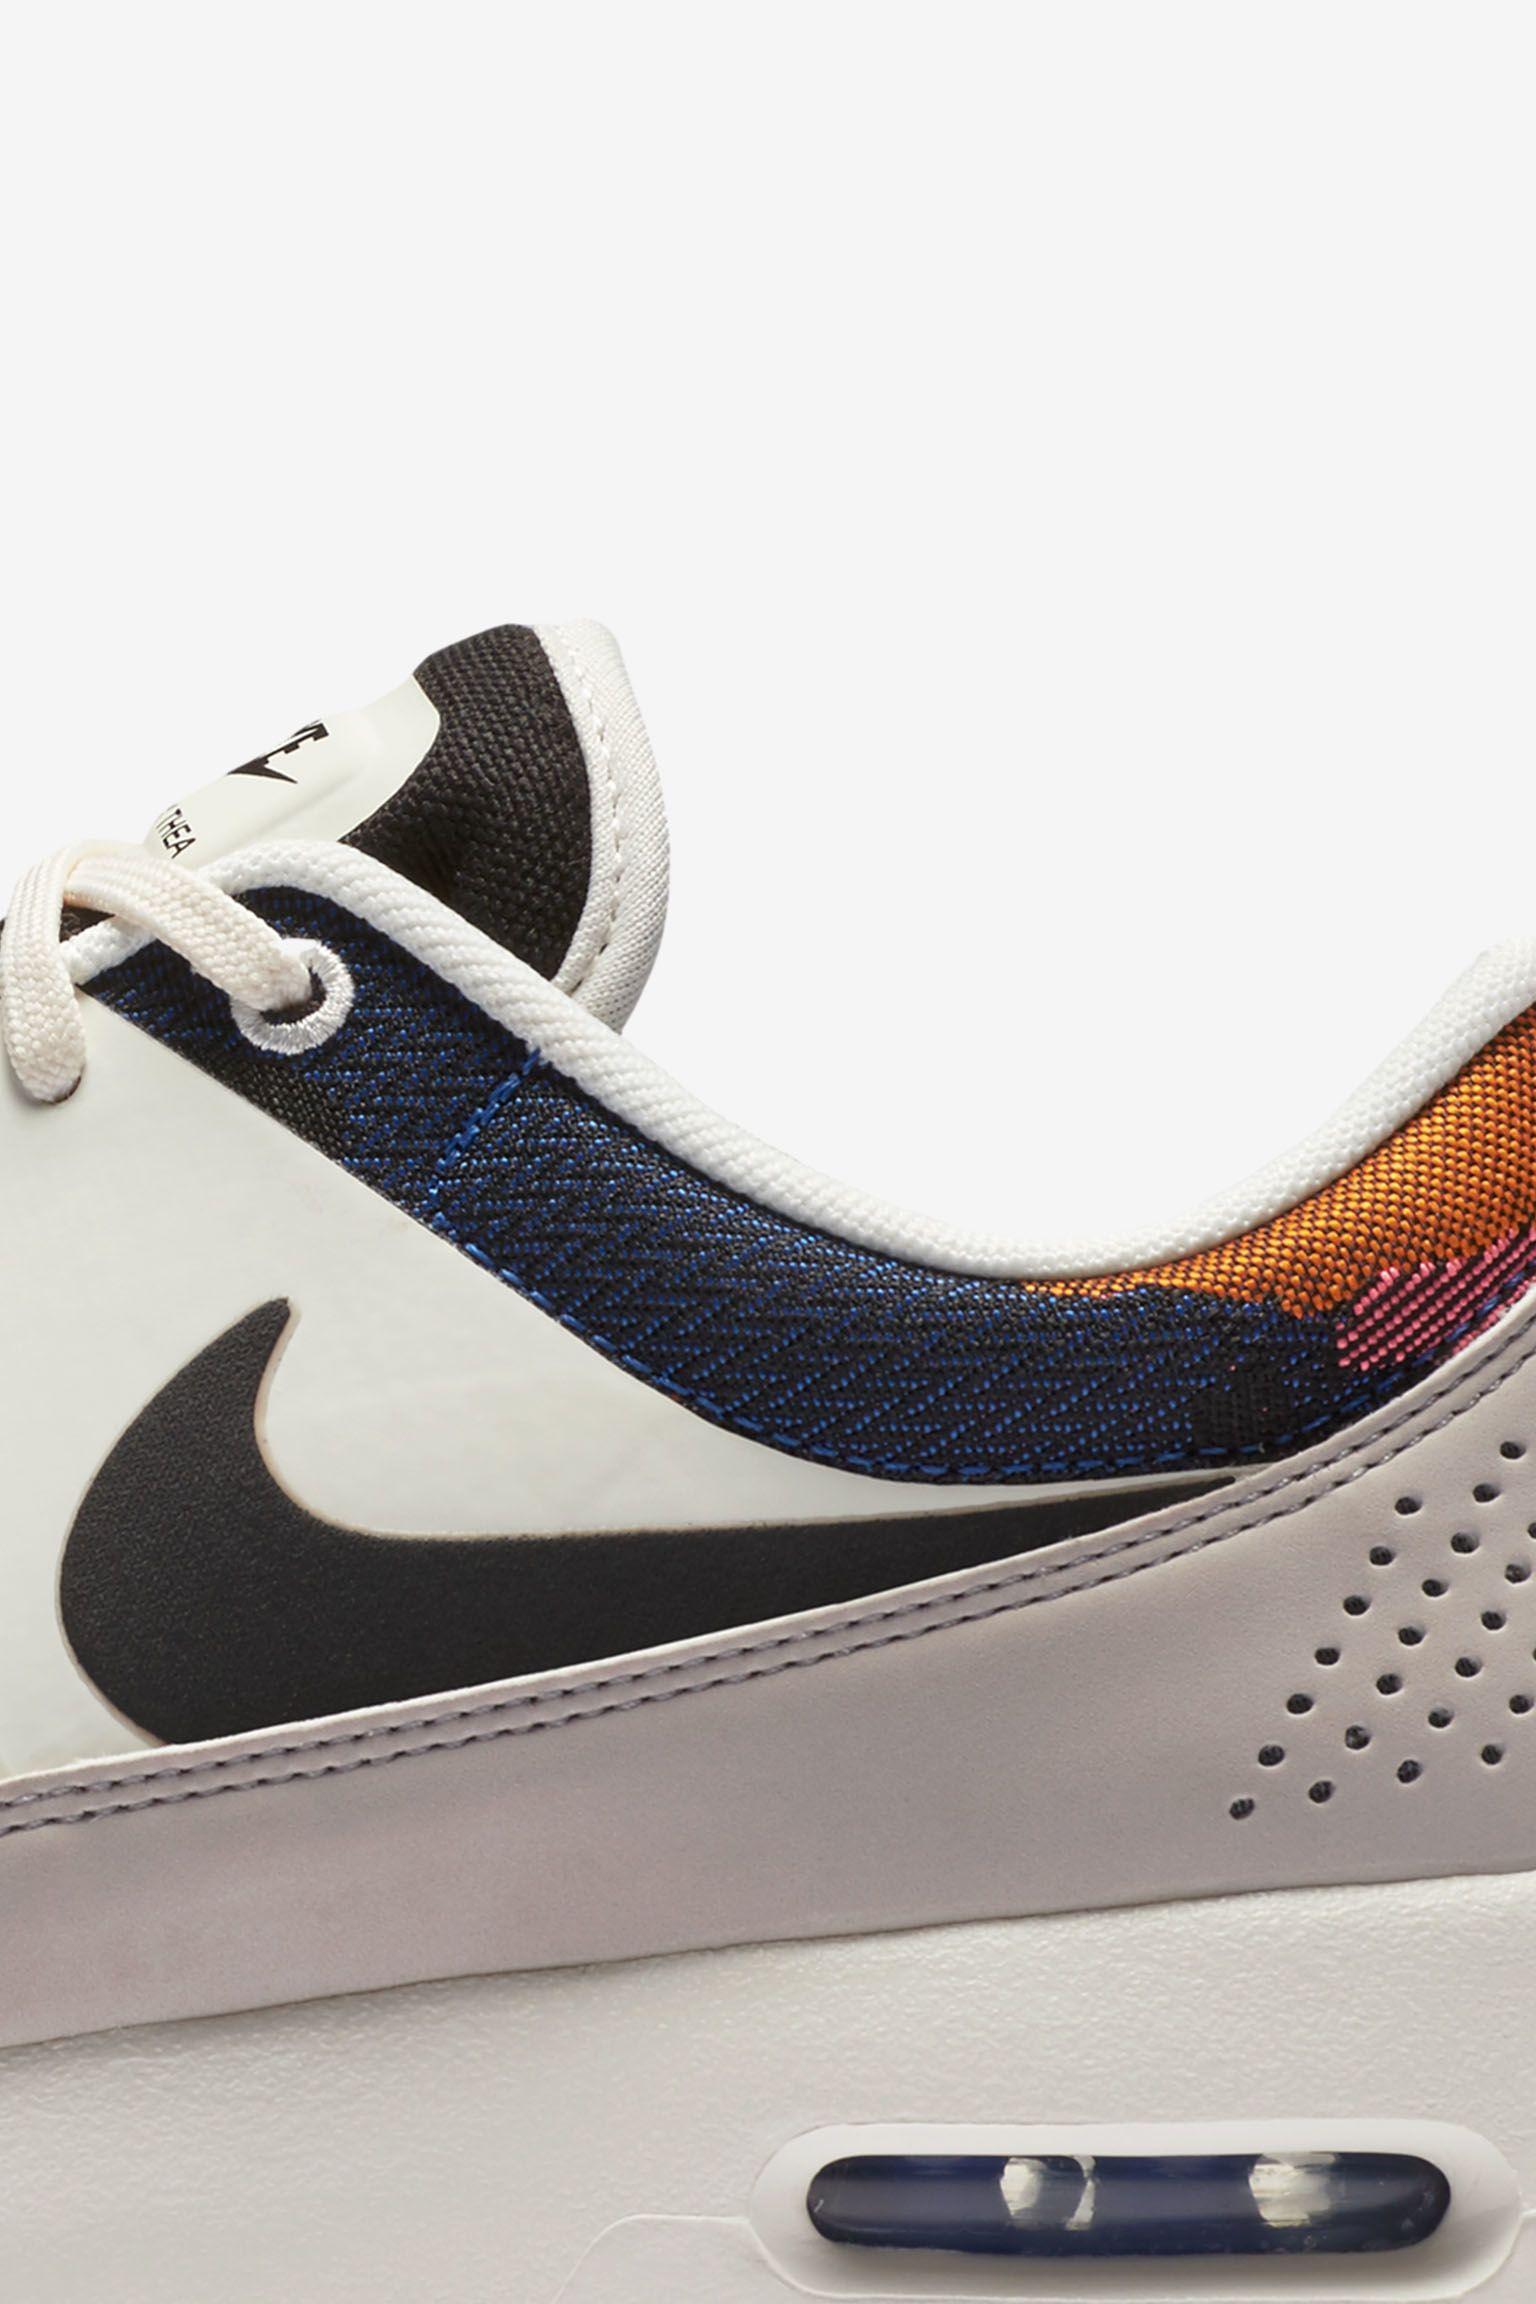 Women's Nike Air Max Thea Jacquard 'Premium Print'